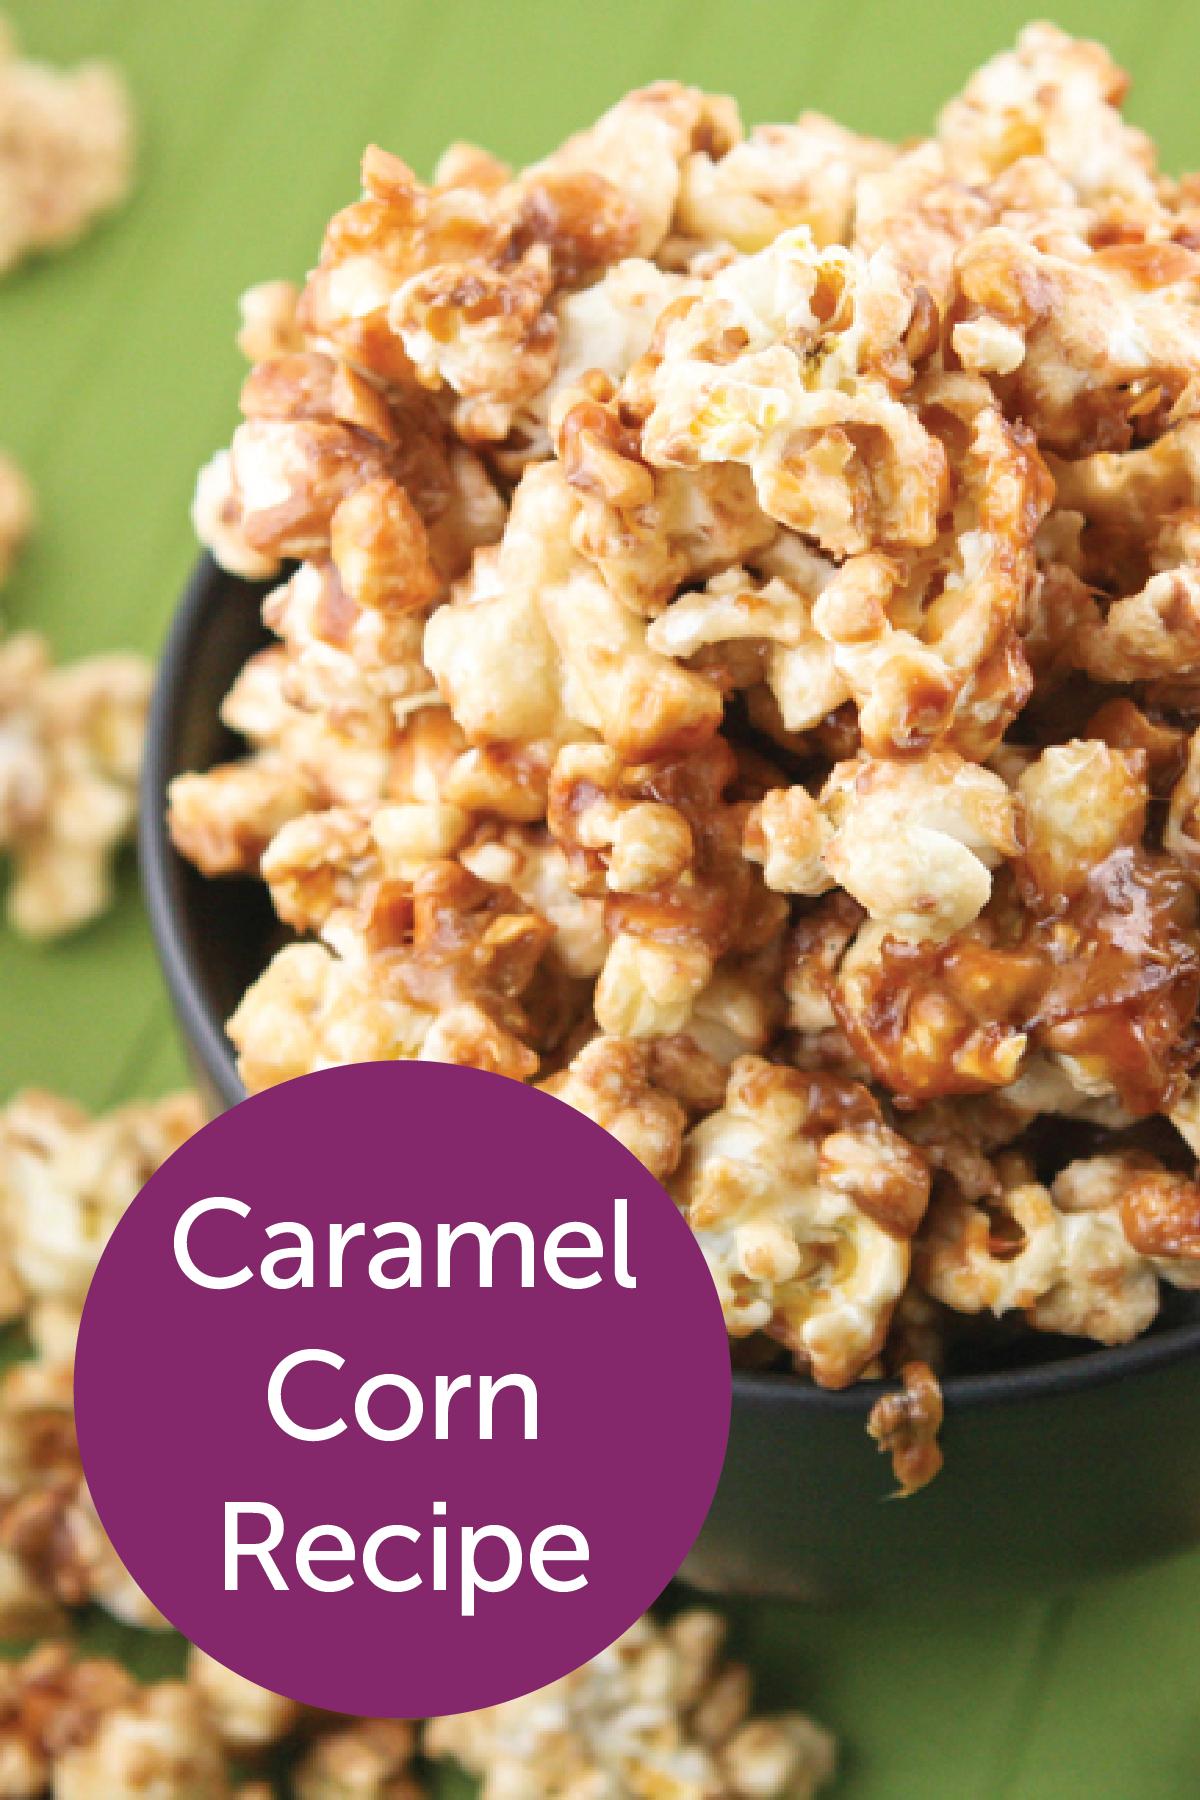 Baby Ruth Caramel Corn   Caramel corn, Caramel corn ...